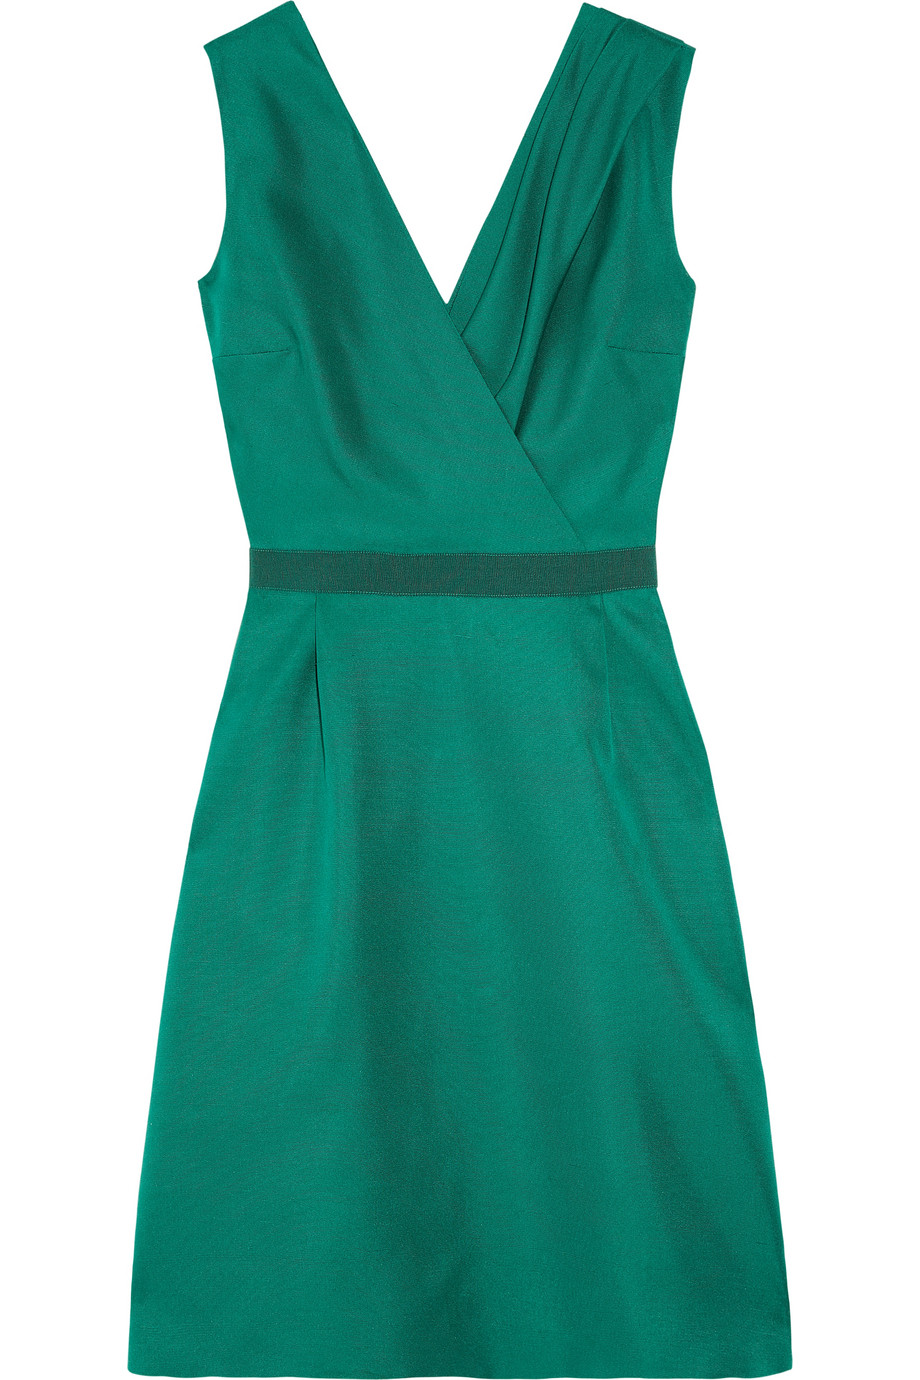 Giambattista Valli Silk Shantung Wrap Effect Dress In Teal